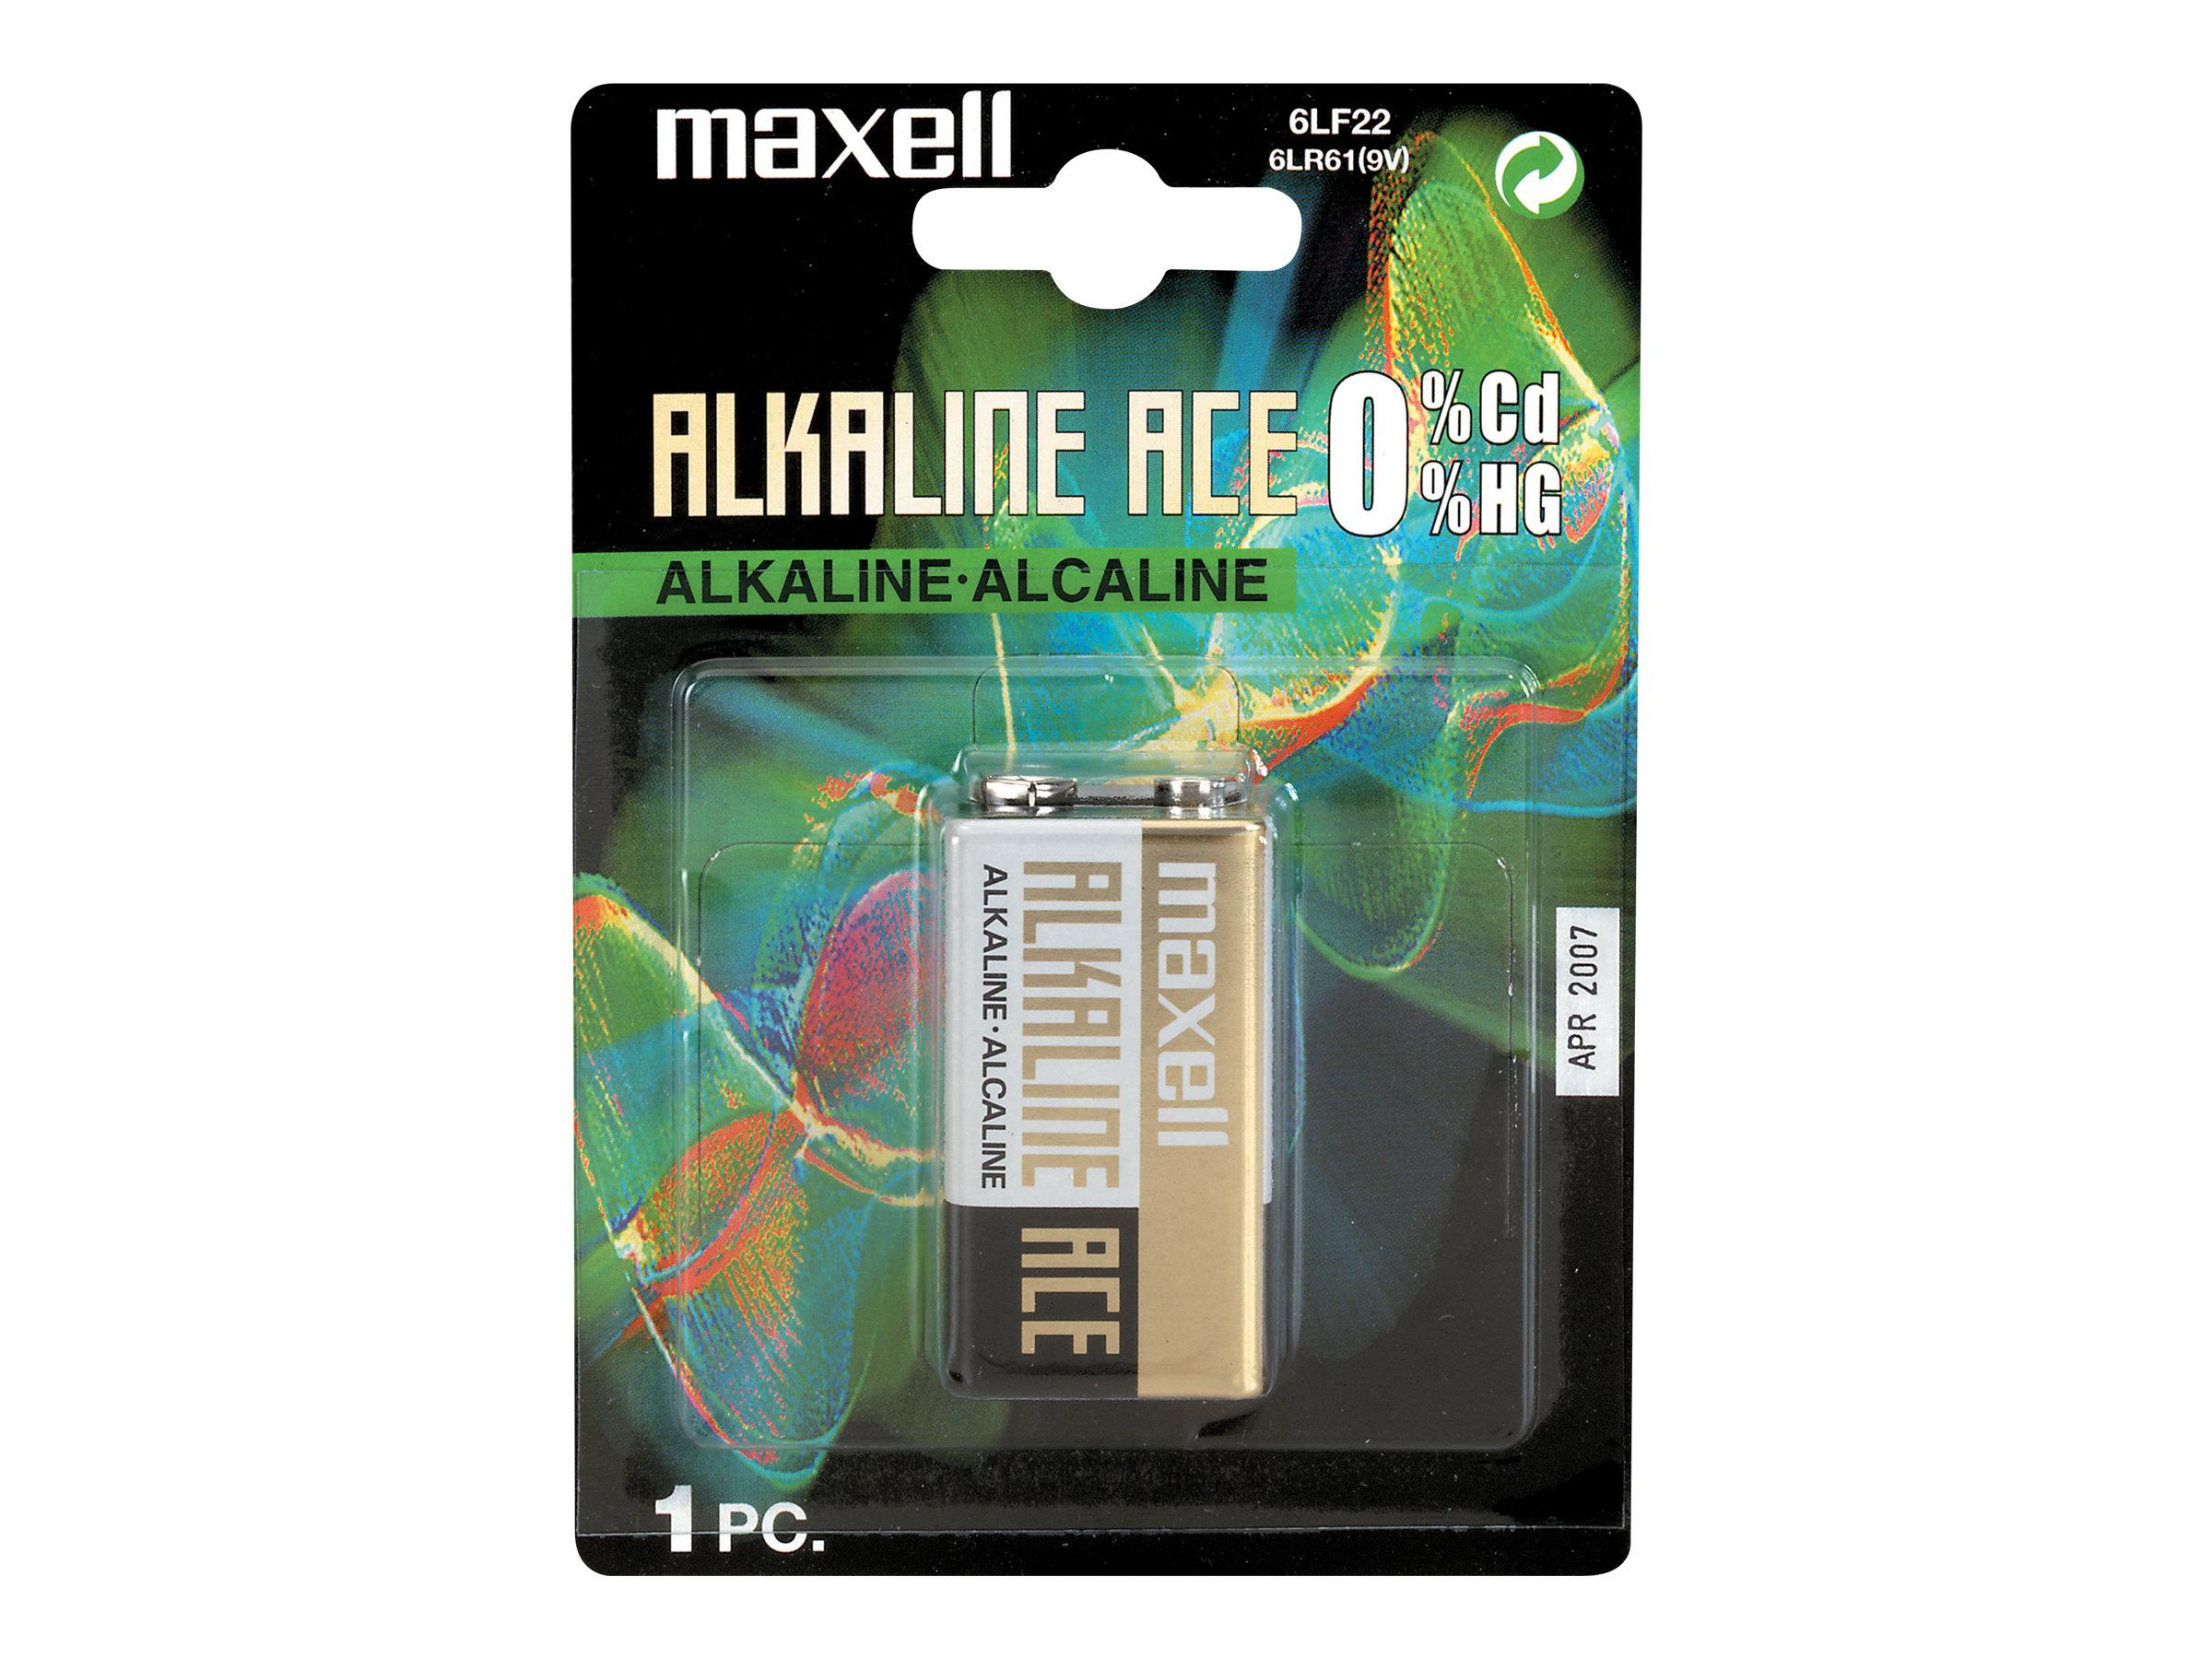 Maxell 6LF 22 - Batterie 9V - Alkalisch